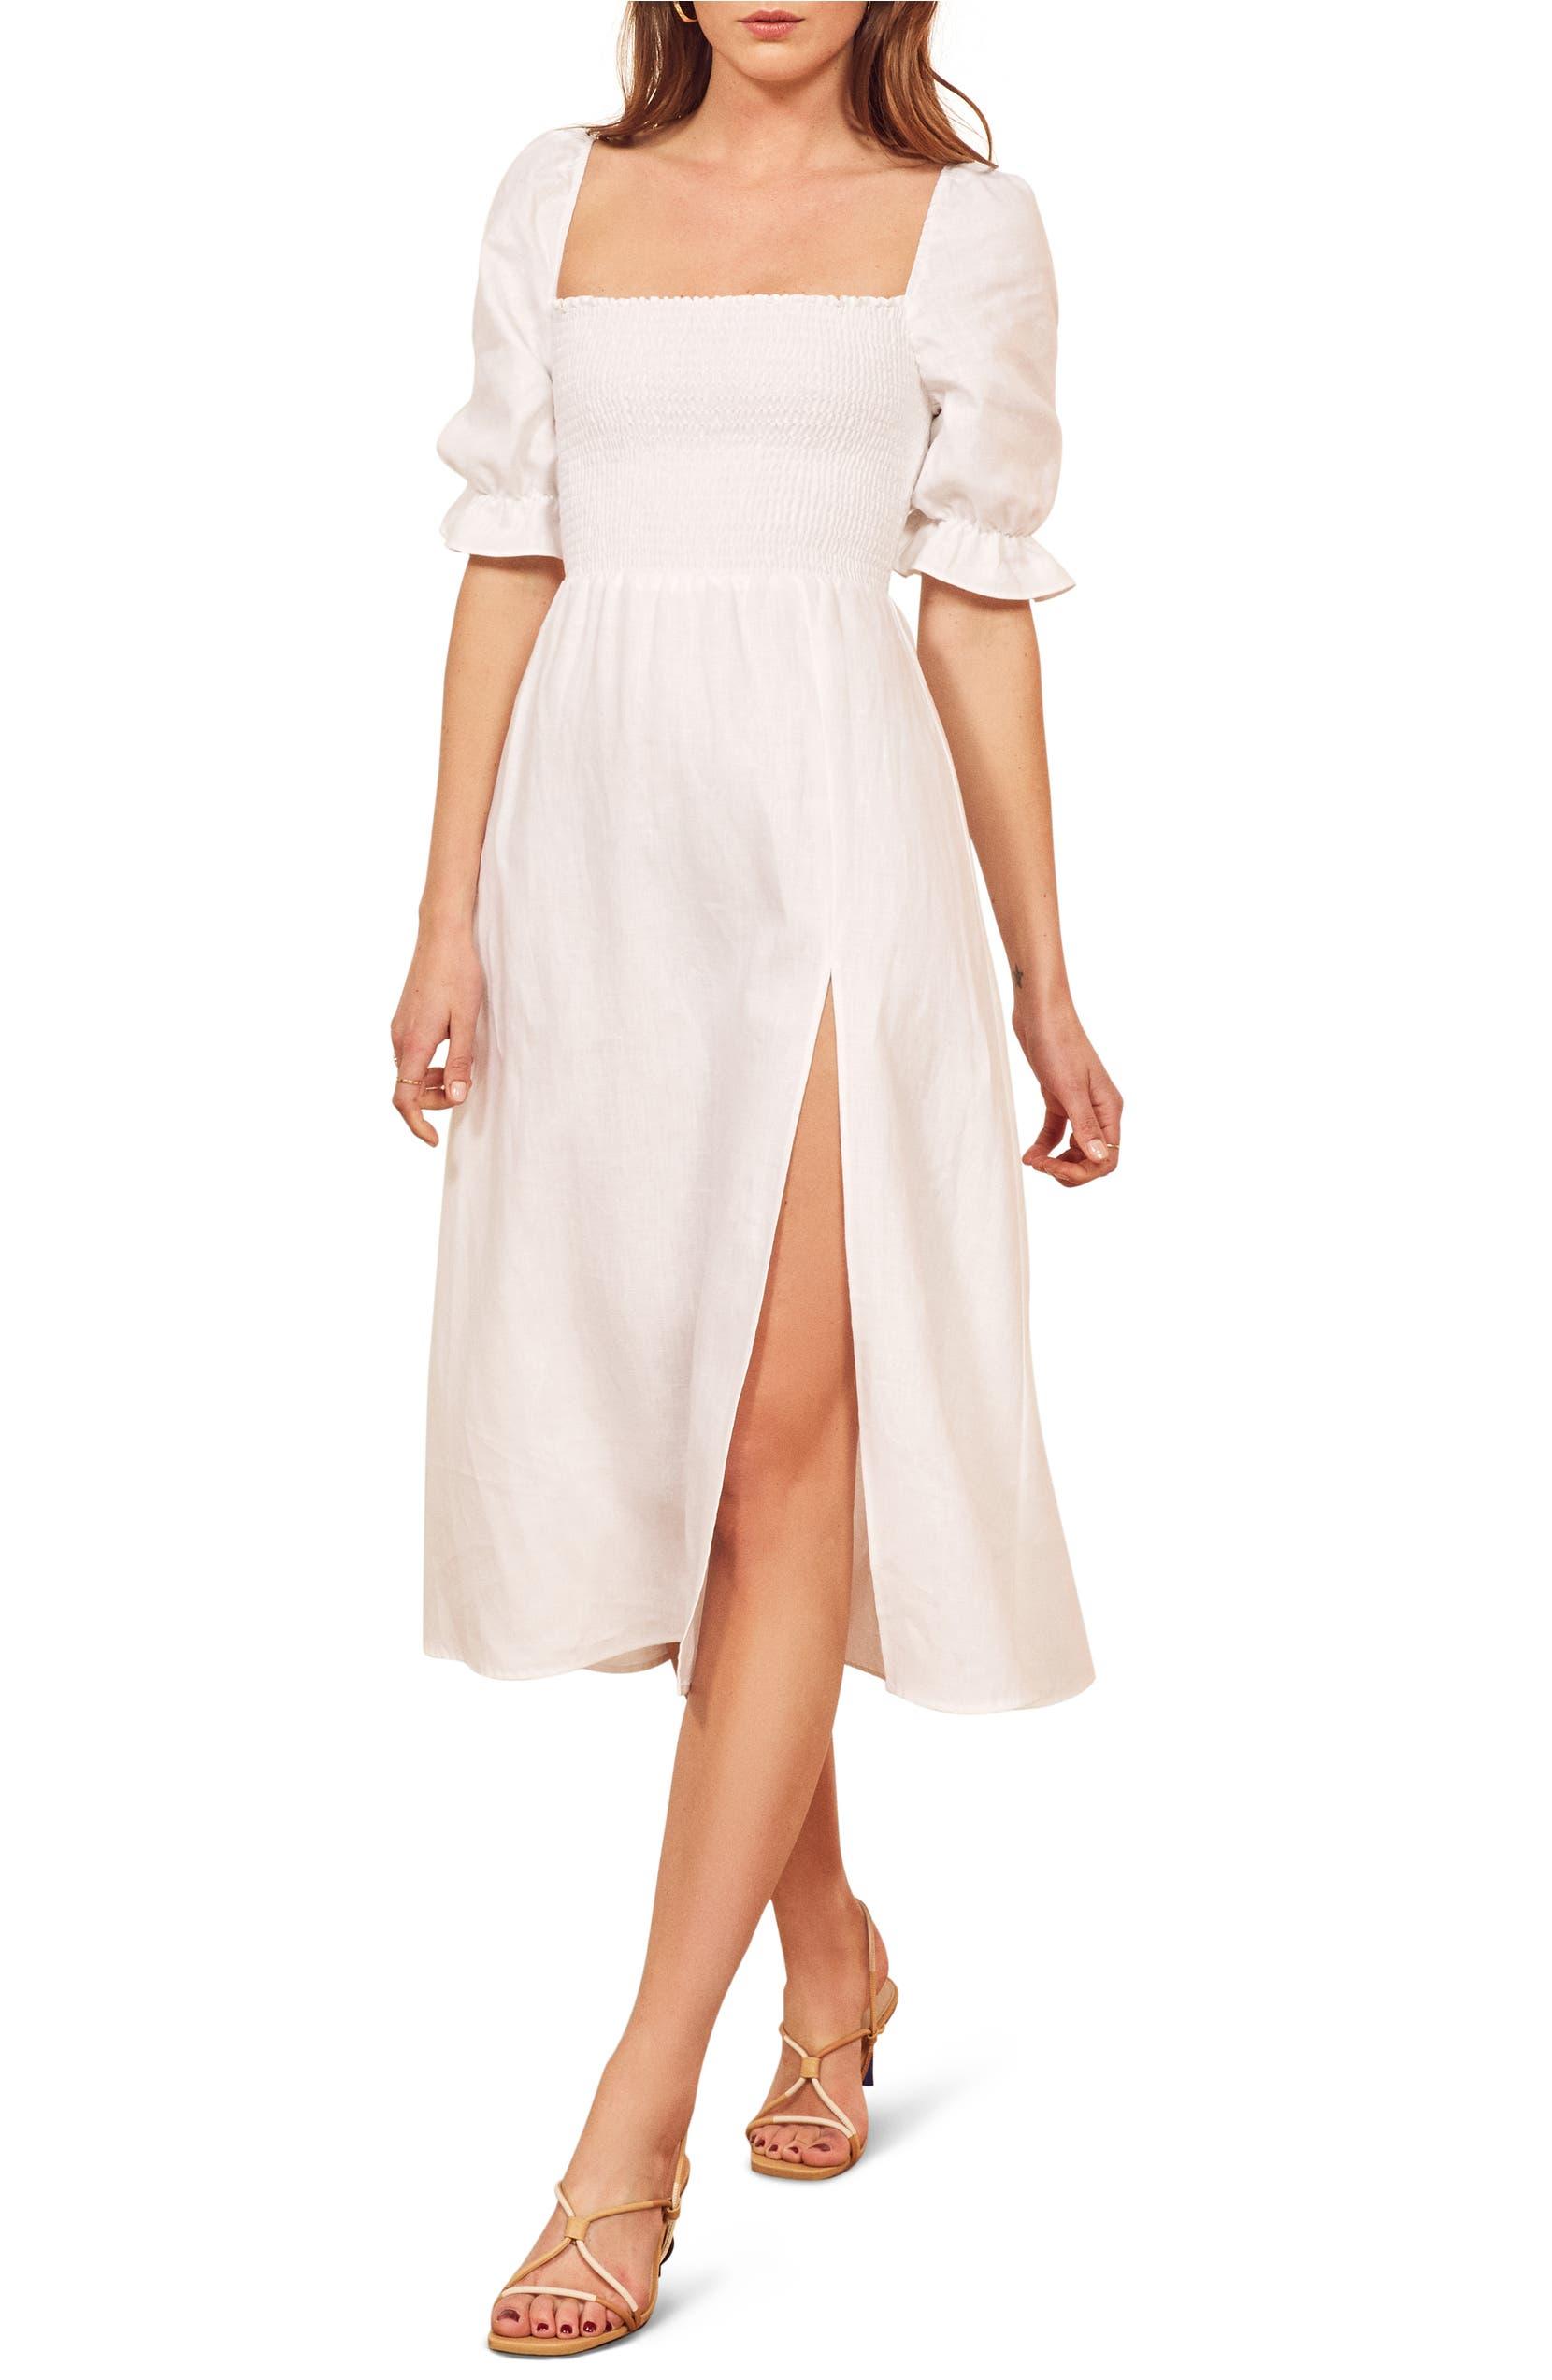 Reformation Marabella Linen Dress (Regular & Plus Size) | Nordstrom